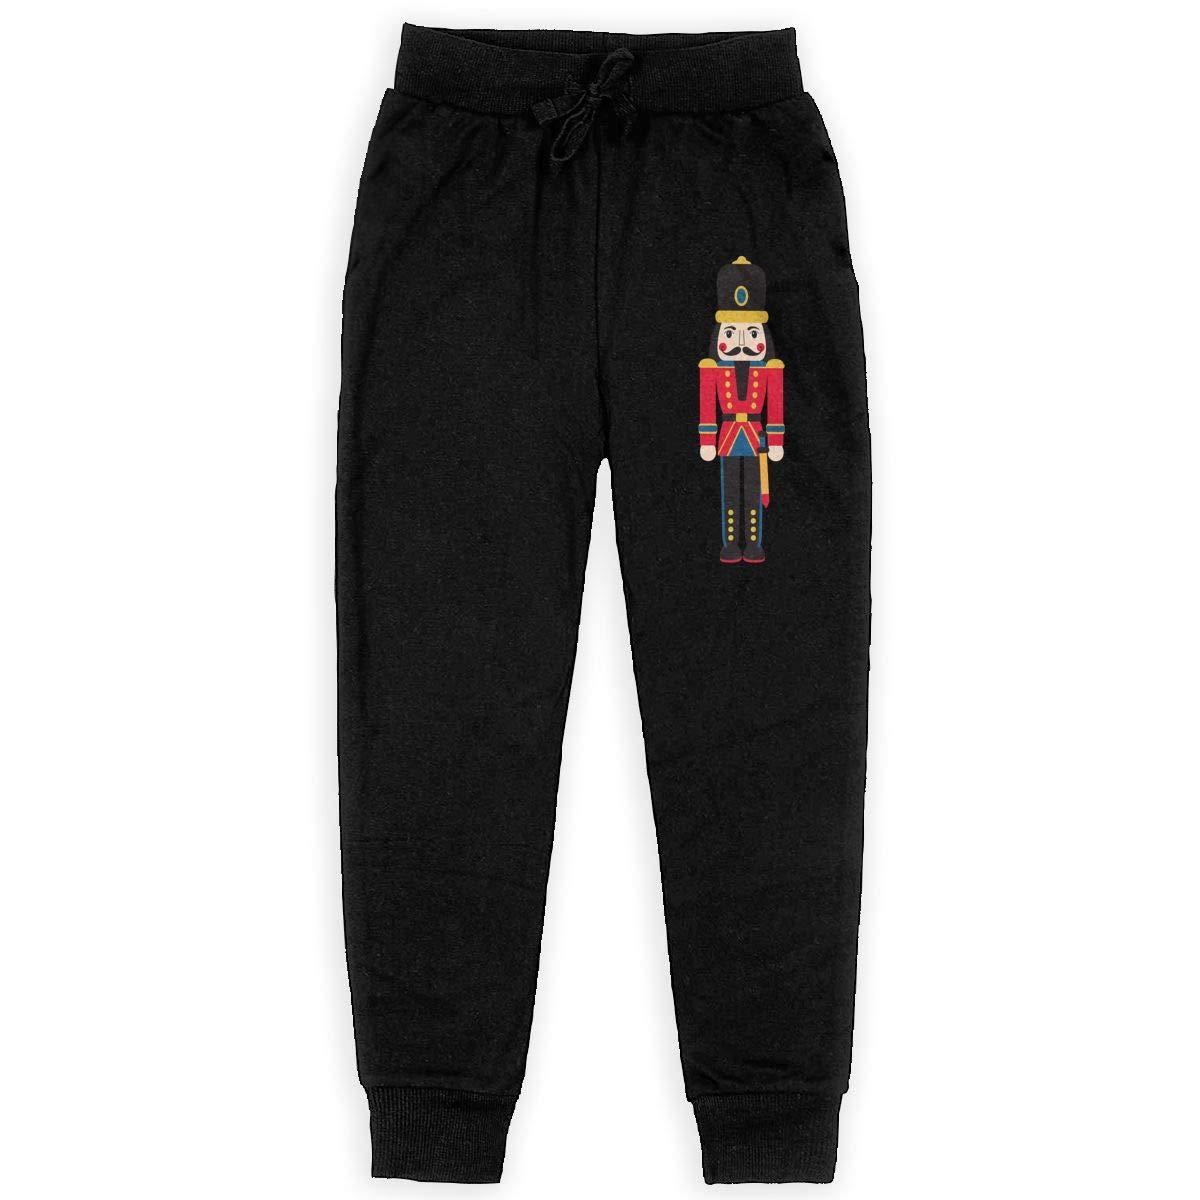 Boys Sweatpants Soldier Figurine Nutcracker Joggers Sport Training Pants Trousers Cotton Sweatpants for Youth